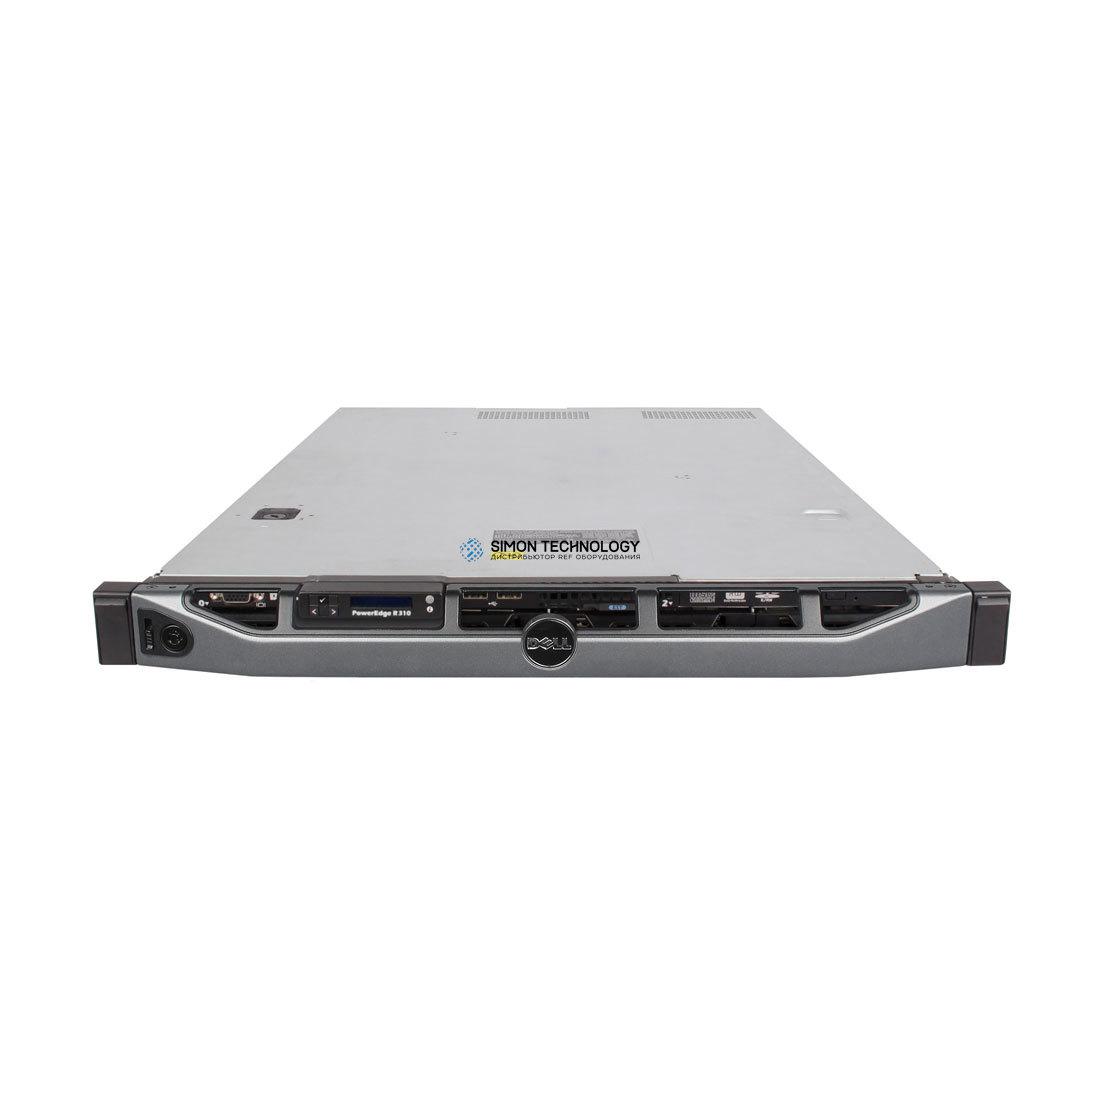 Сервер Dell R310 1*X3440 4GB H200 IDRAC6 4*LFF 2*SFF (R310 X3440)